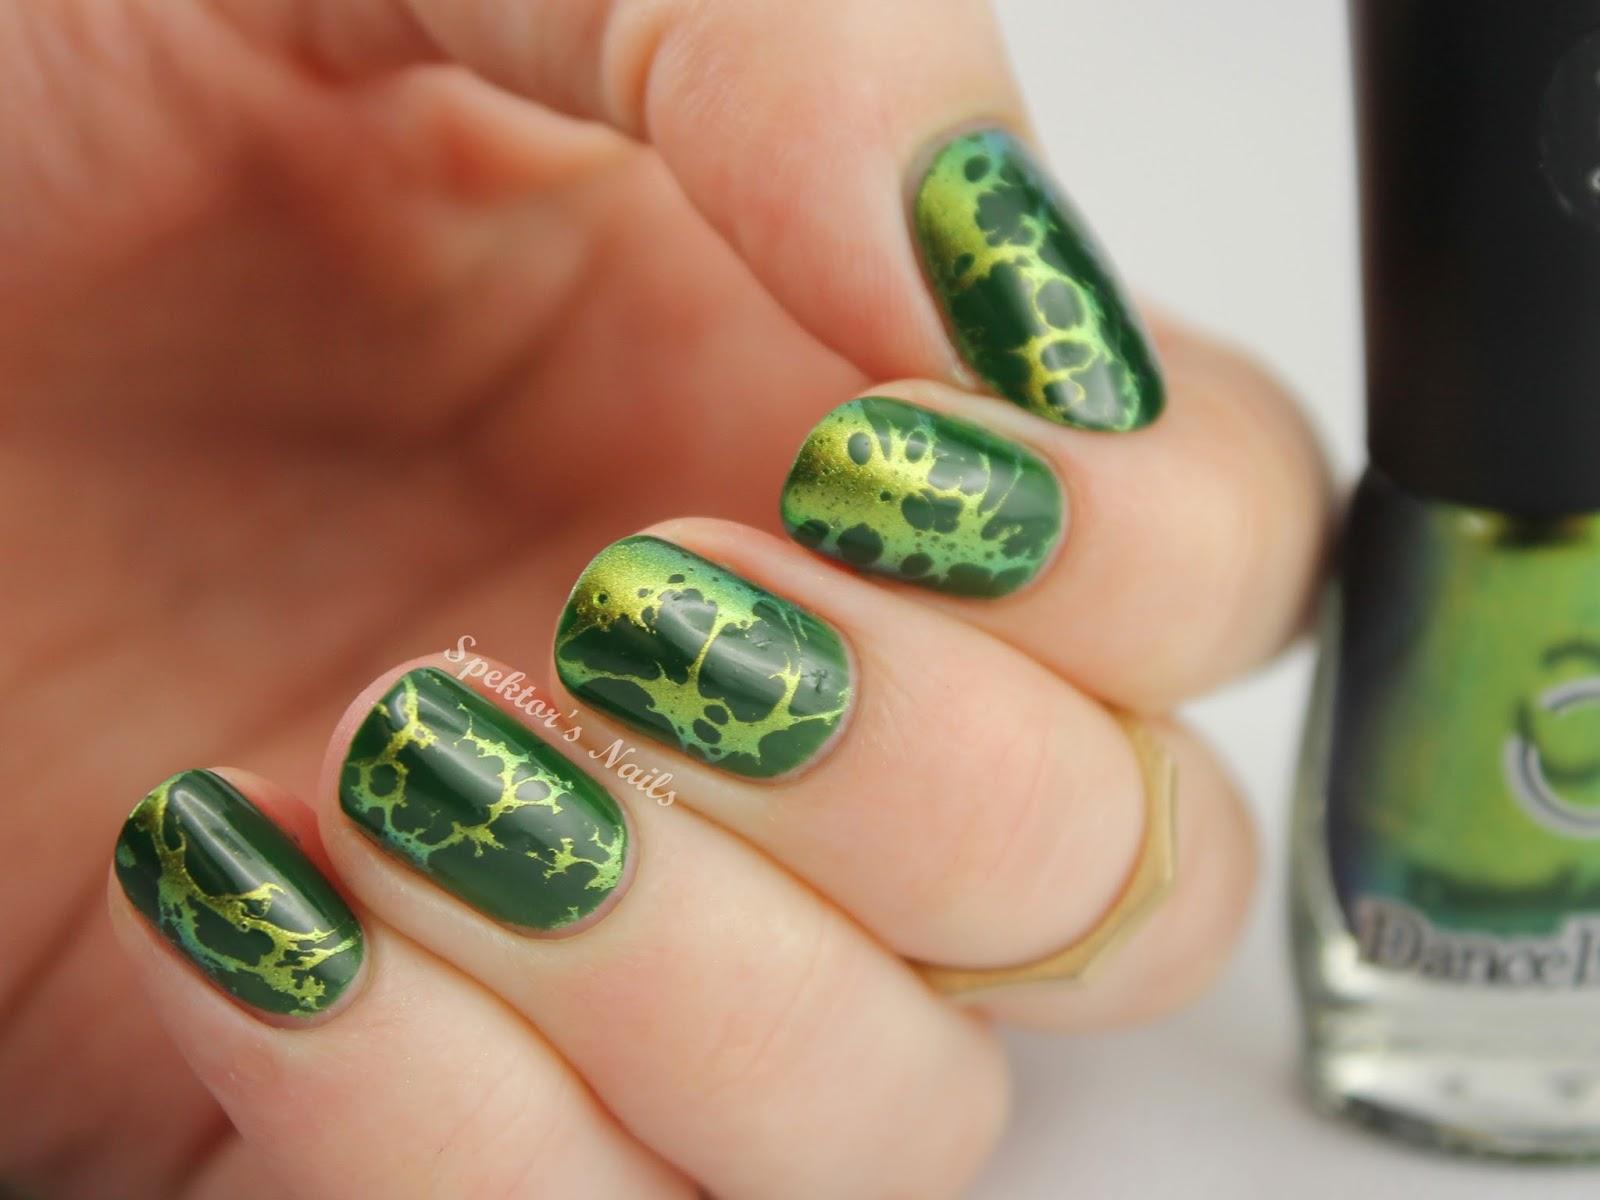 Waterspotted Chameleon Nail Art Dance Legend Wazowski